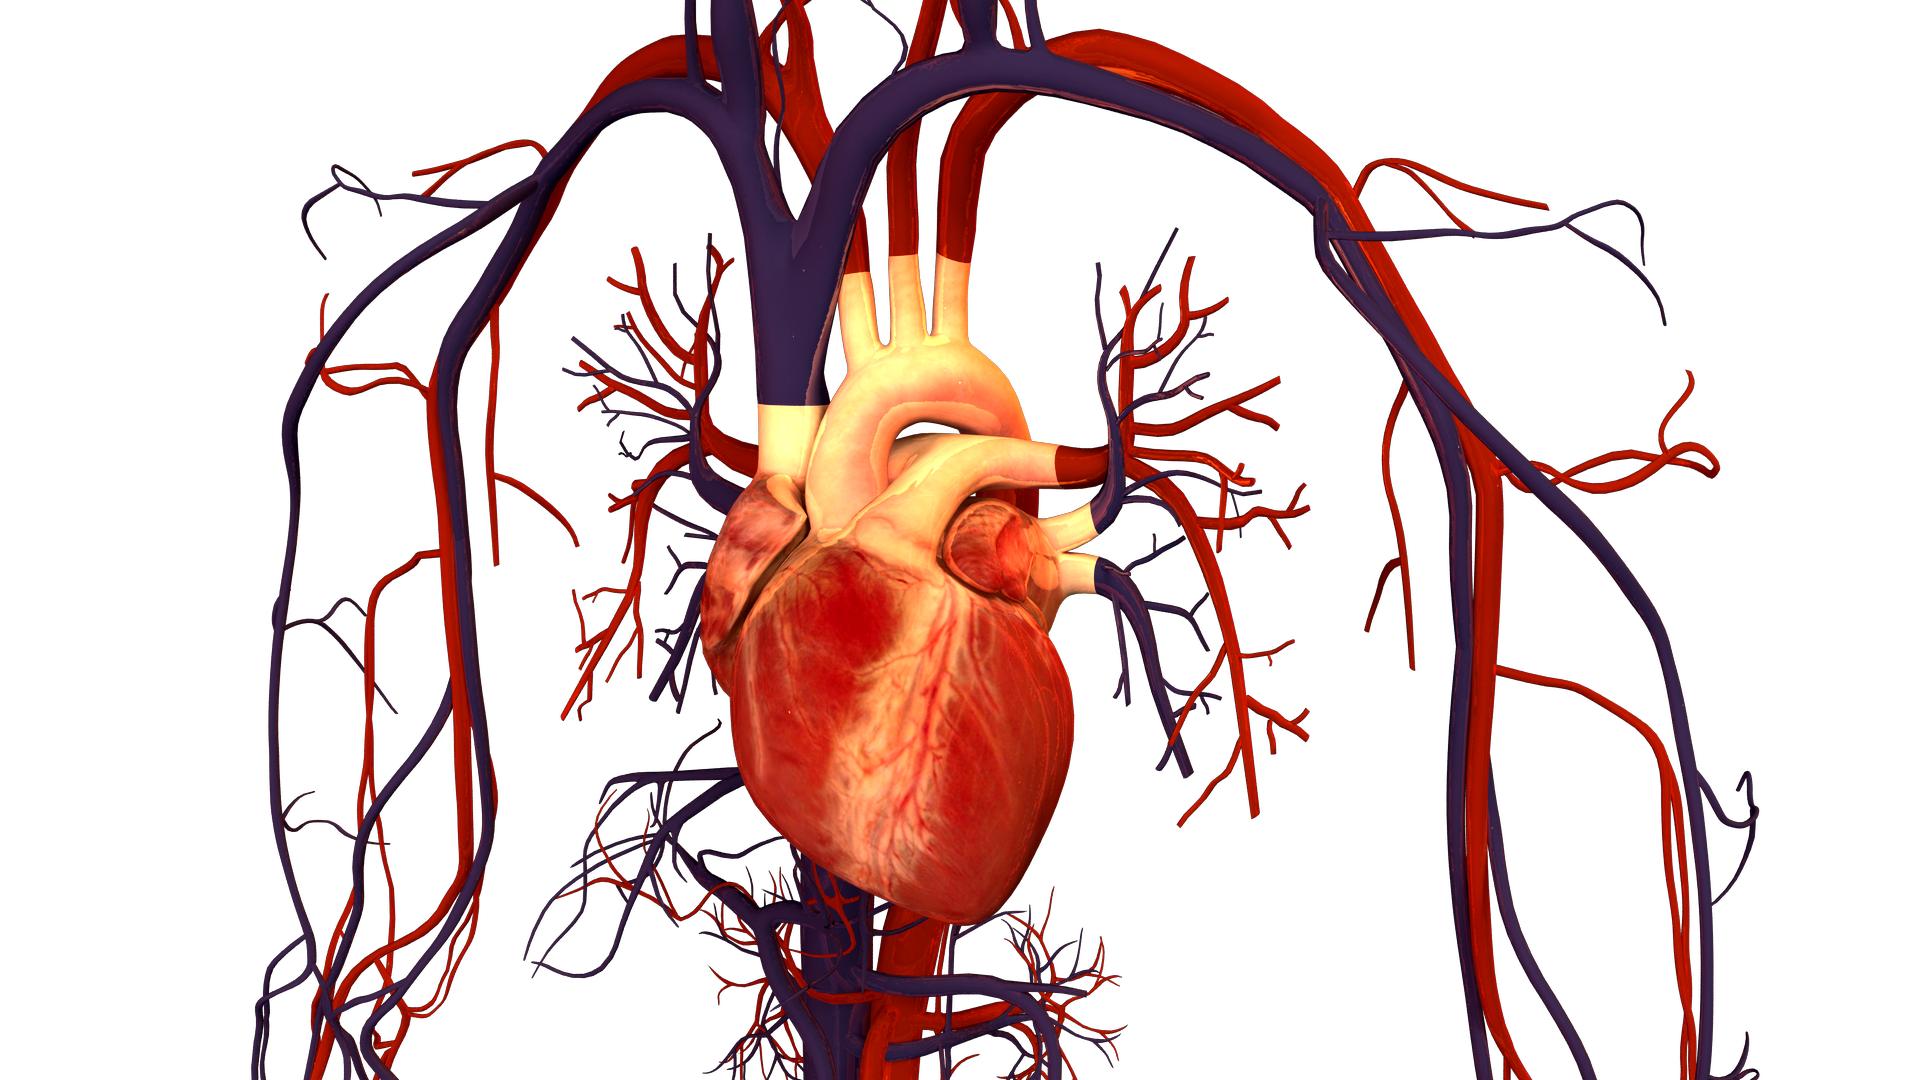 Description-Human-Heart-drawing